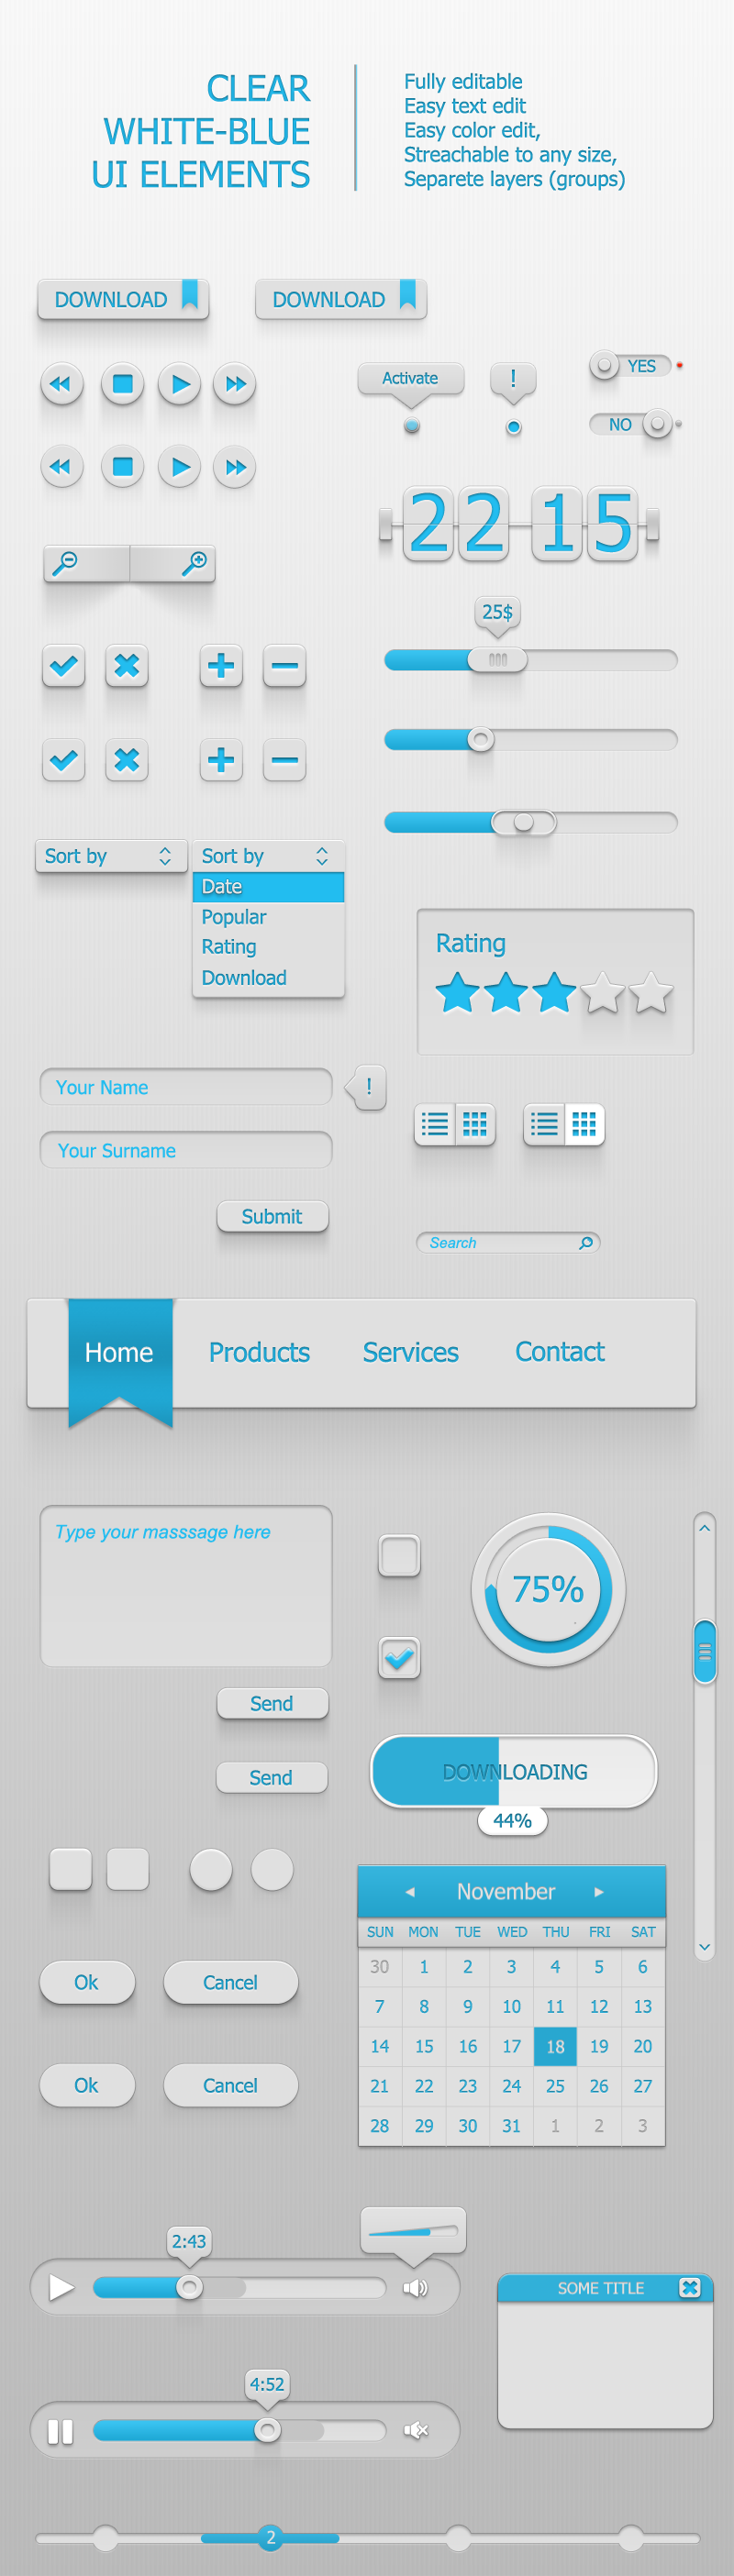 Clear White-Blue UI Elements by popaginovski